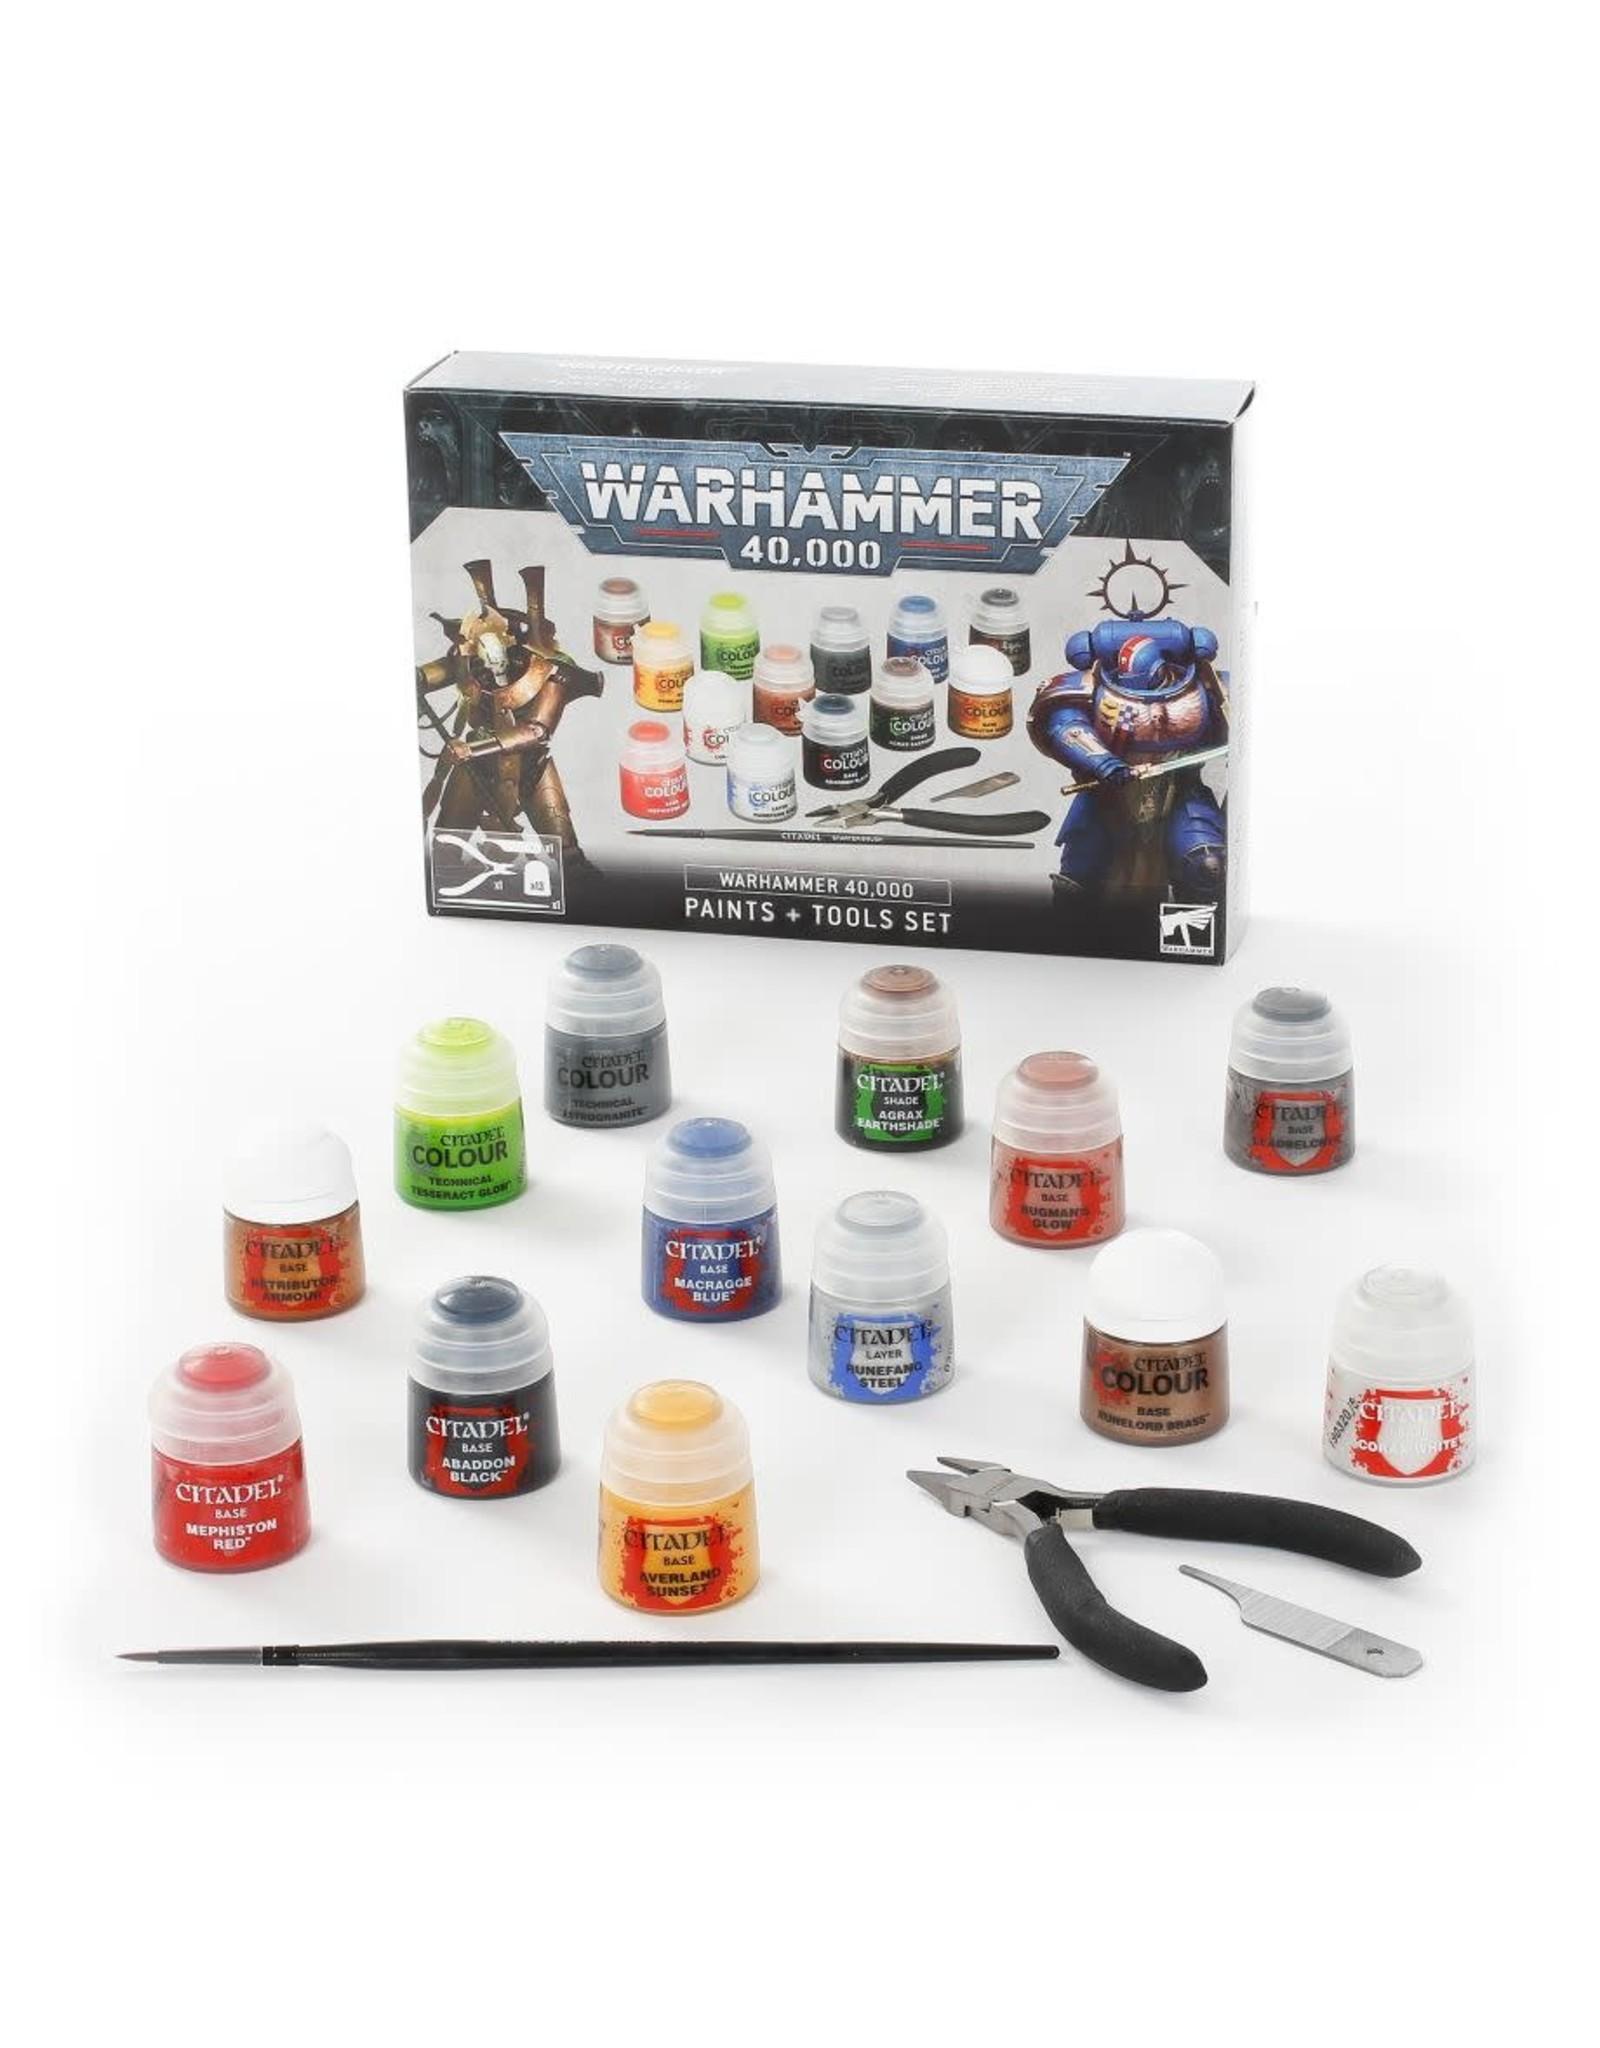 Games-Workshop Warhammer 40,000: Paints + Tools Set